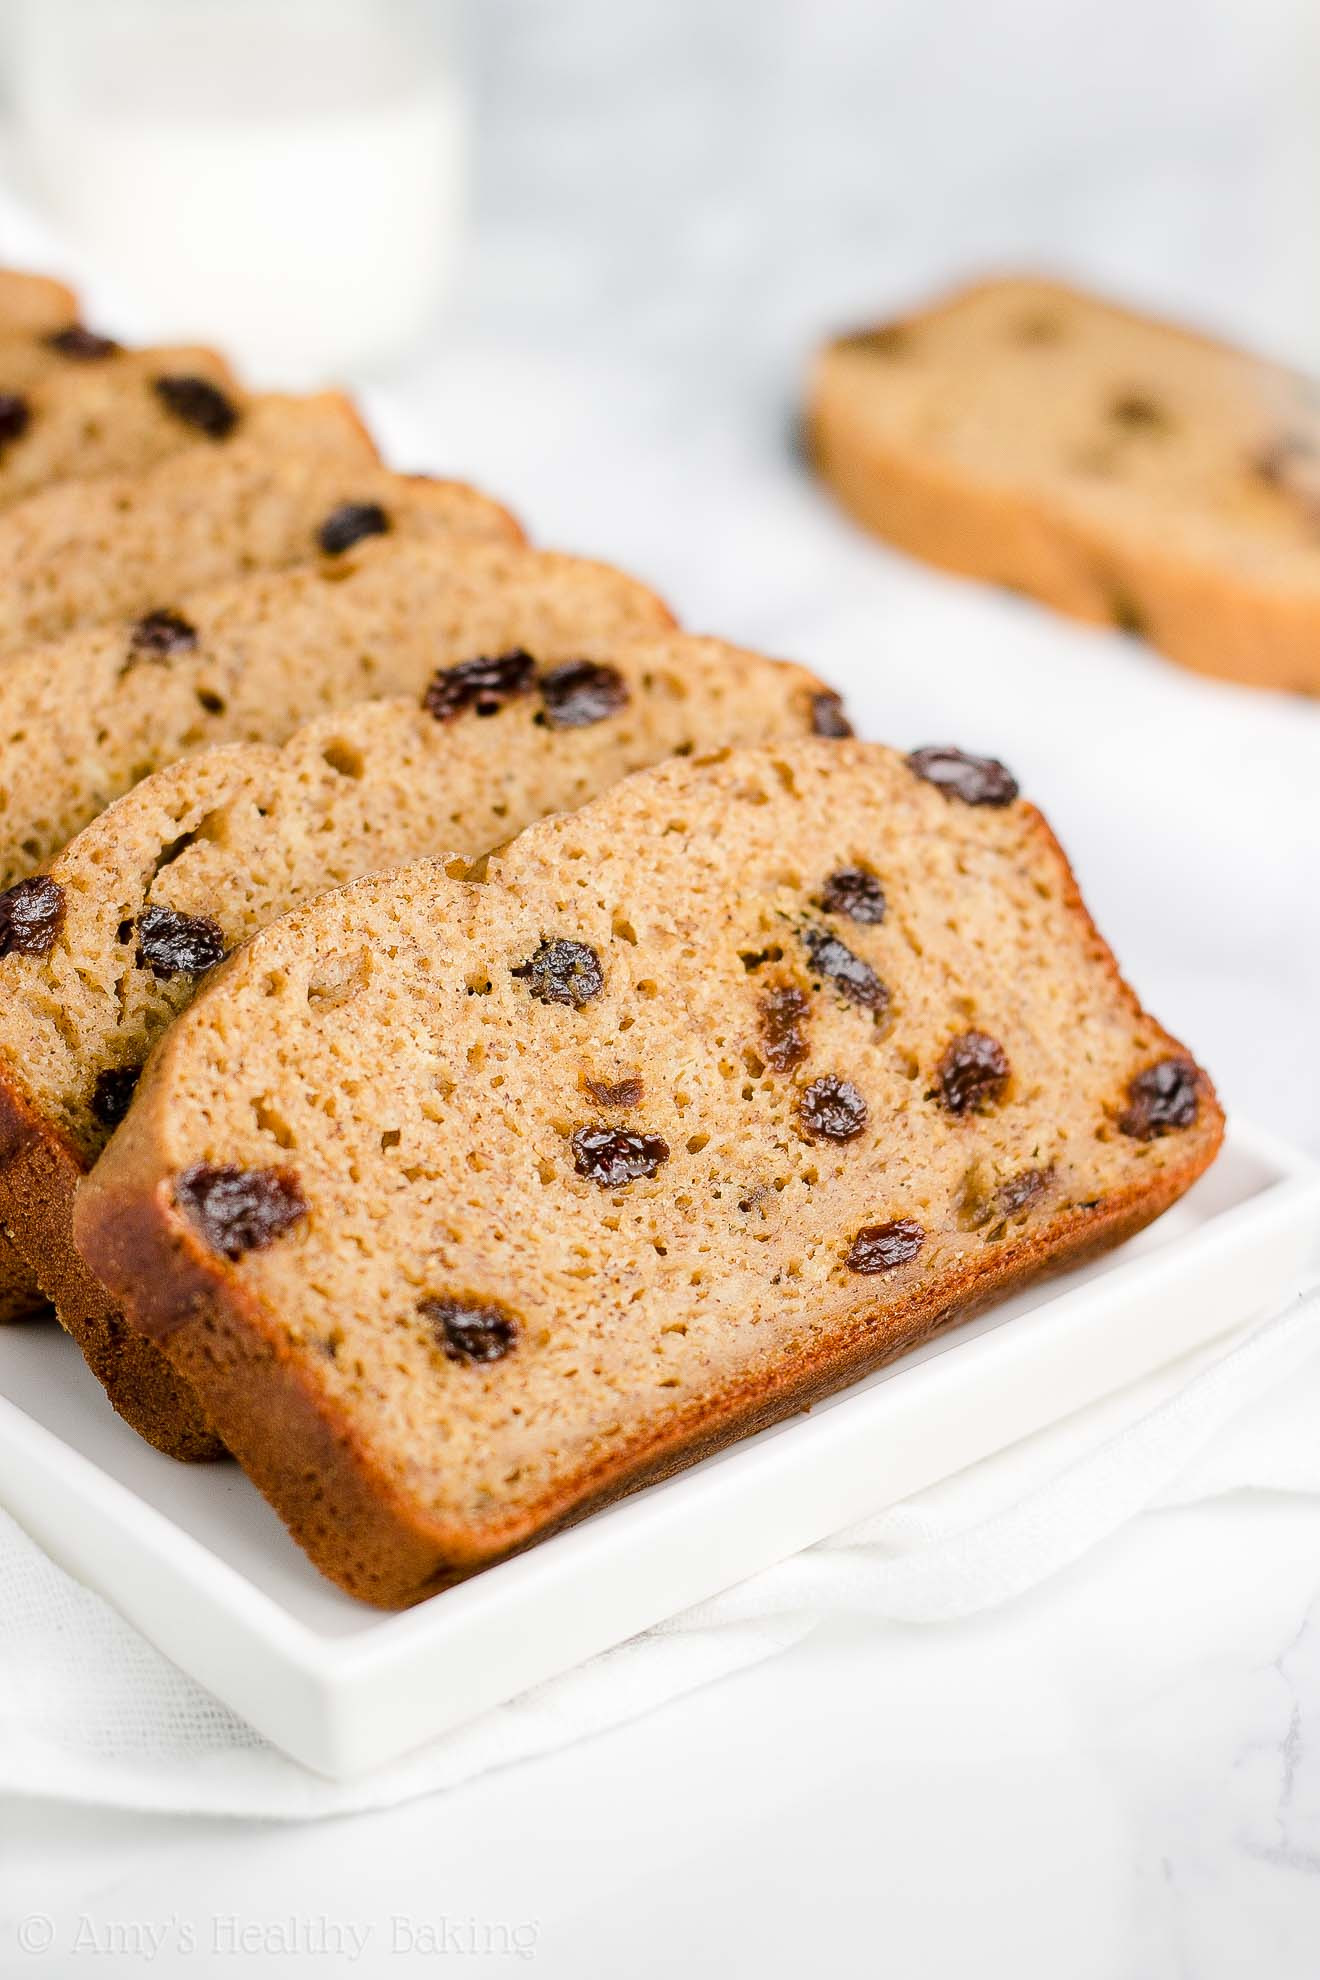 Healthy Cinnamon Bread  Healthy Cinnamon Raisin Banana Bread